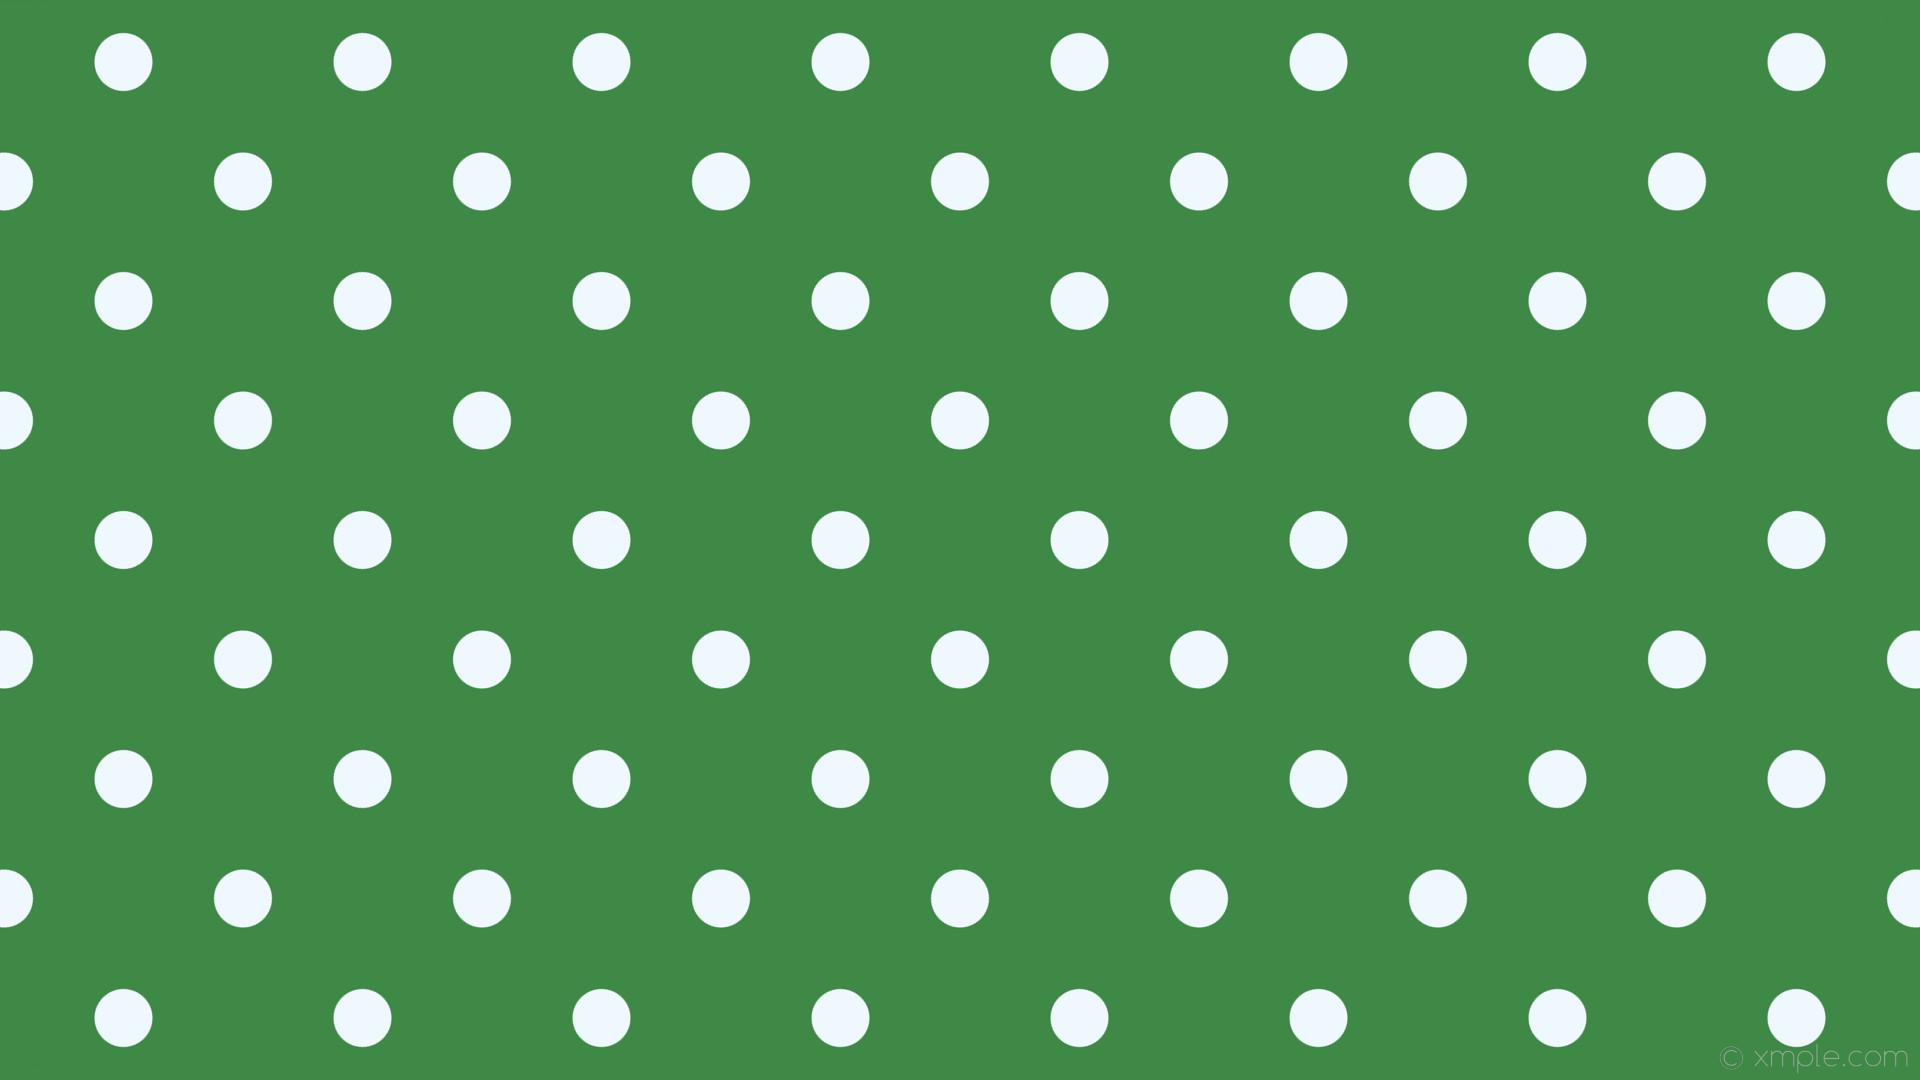 wallpaper spots white polka dots green alice blue #3d8945 #f0f8ff 315° 58px  169px